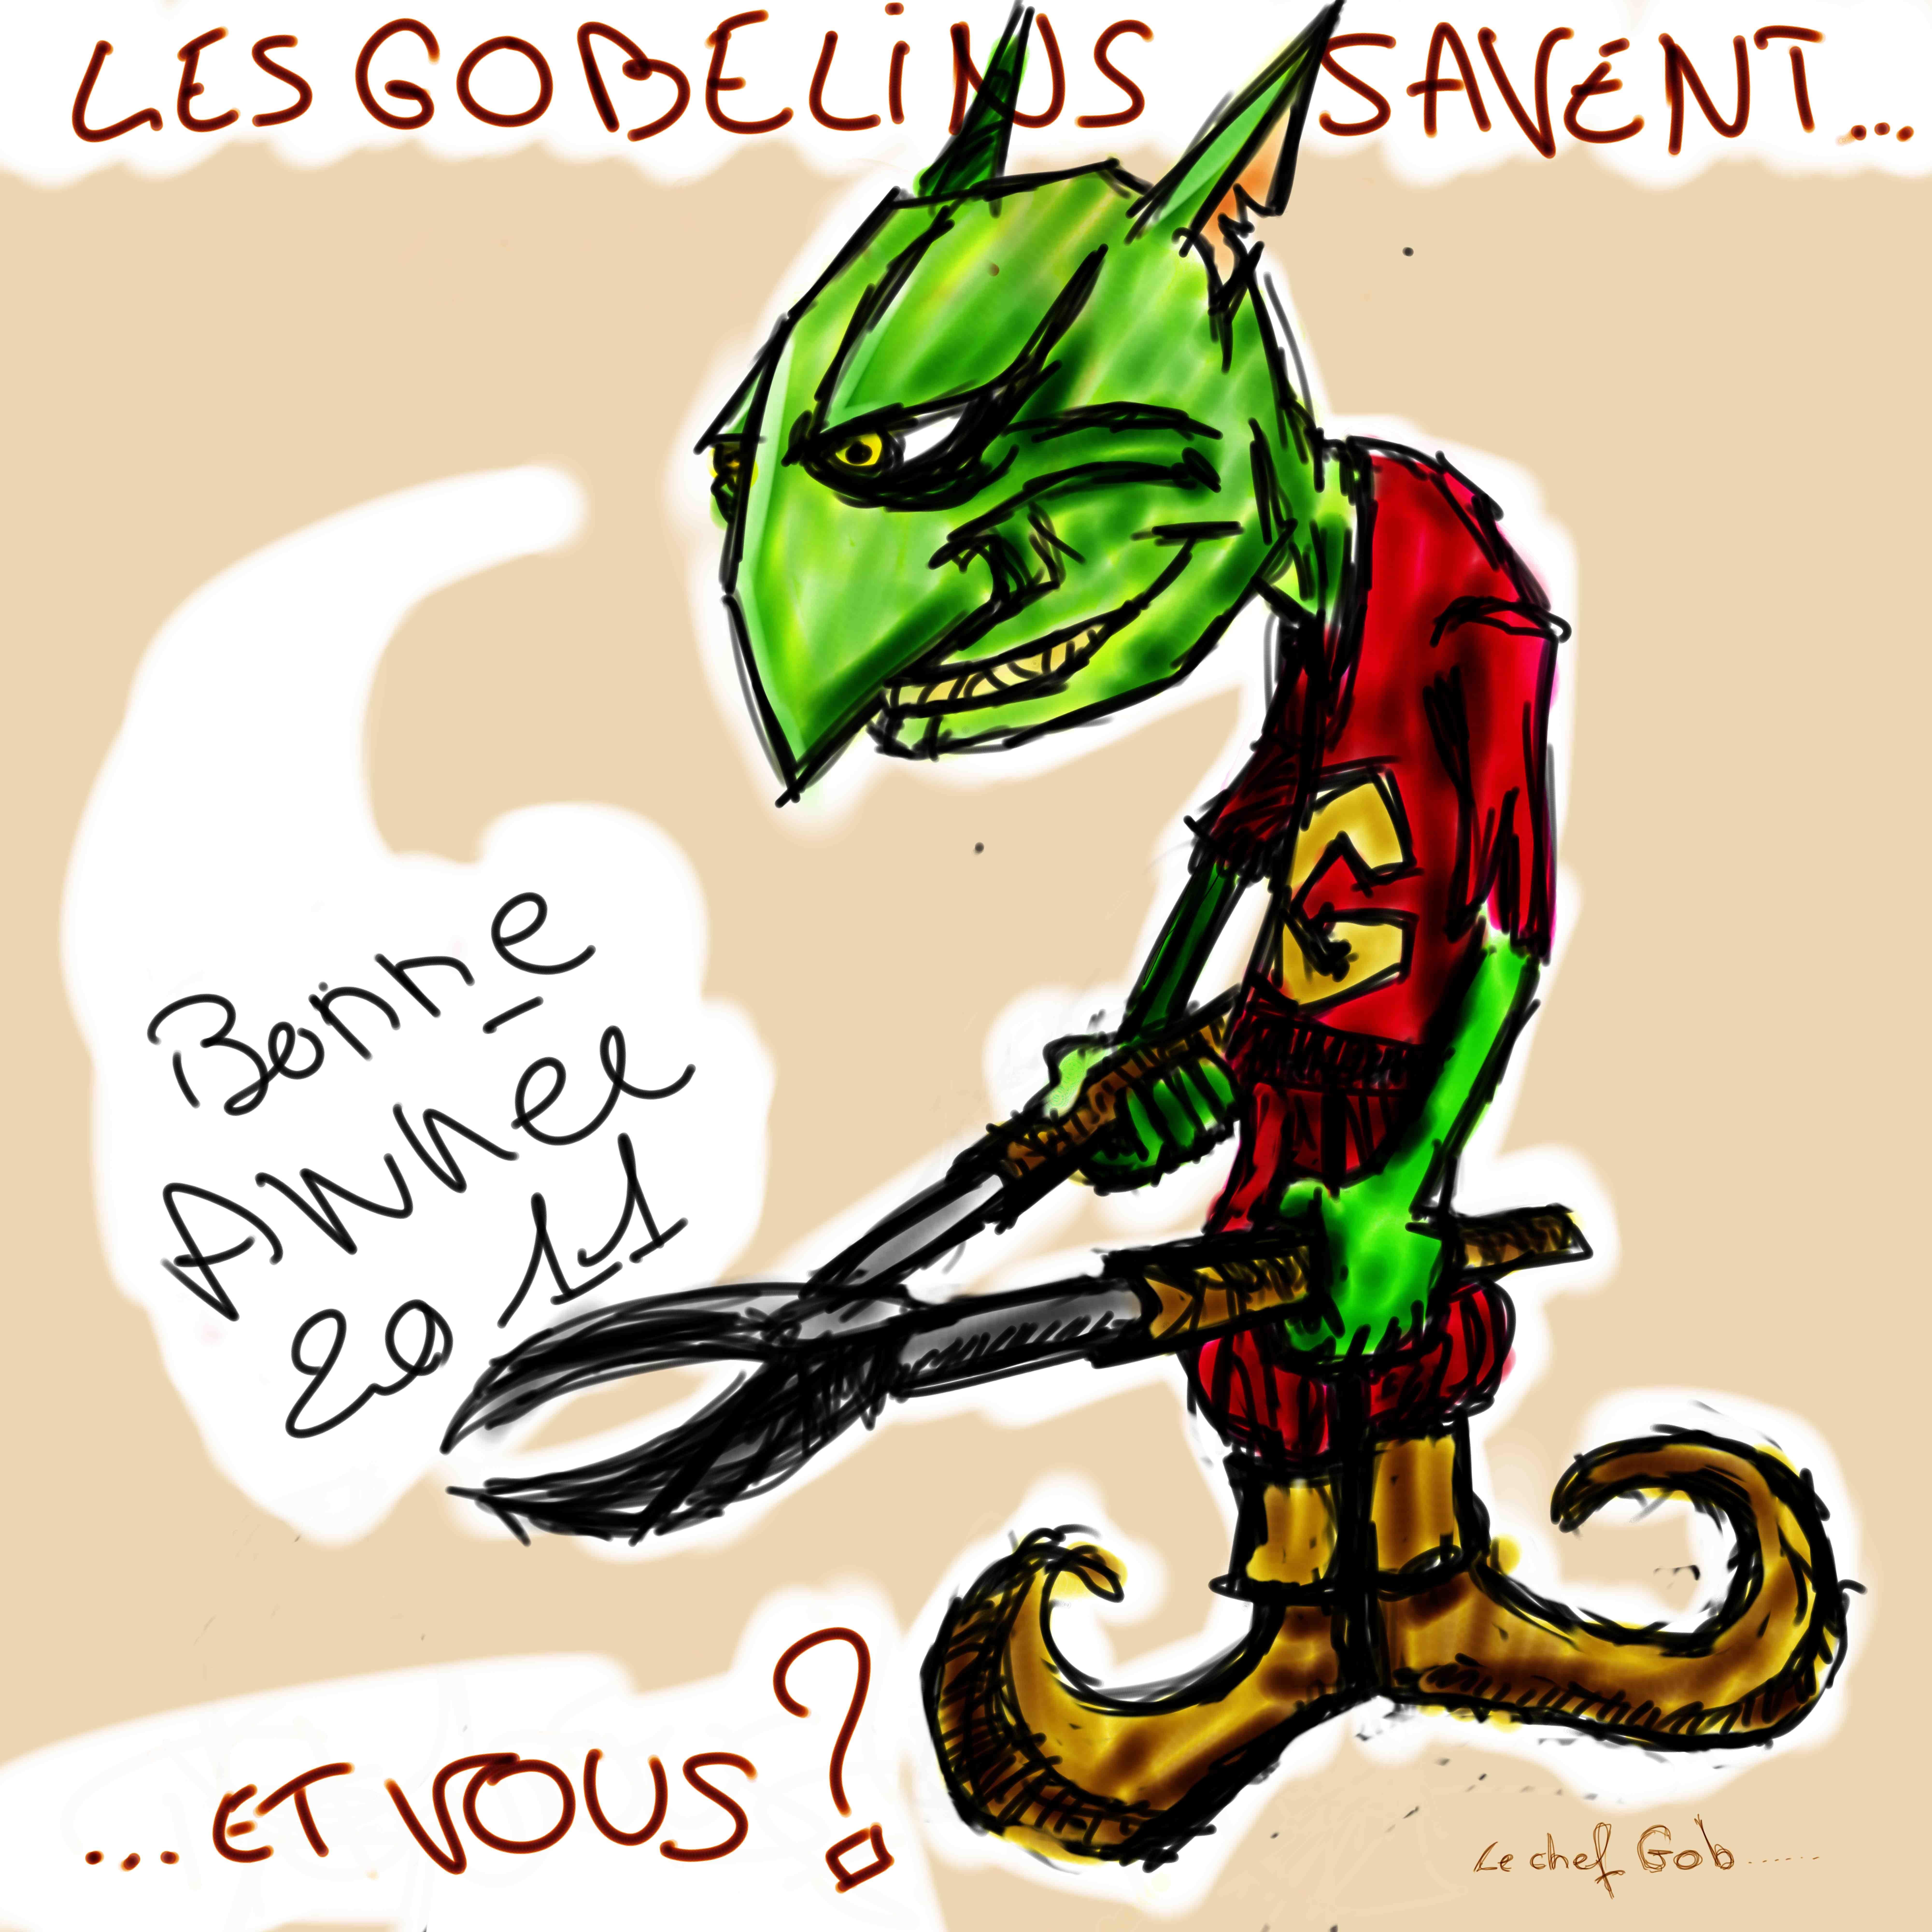 http://mageta.fr.free.fr/dessins/gob%20bonne%20annee.JPG